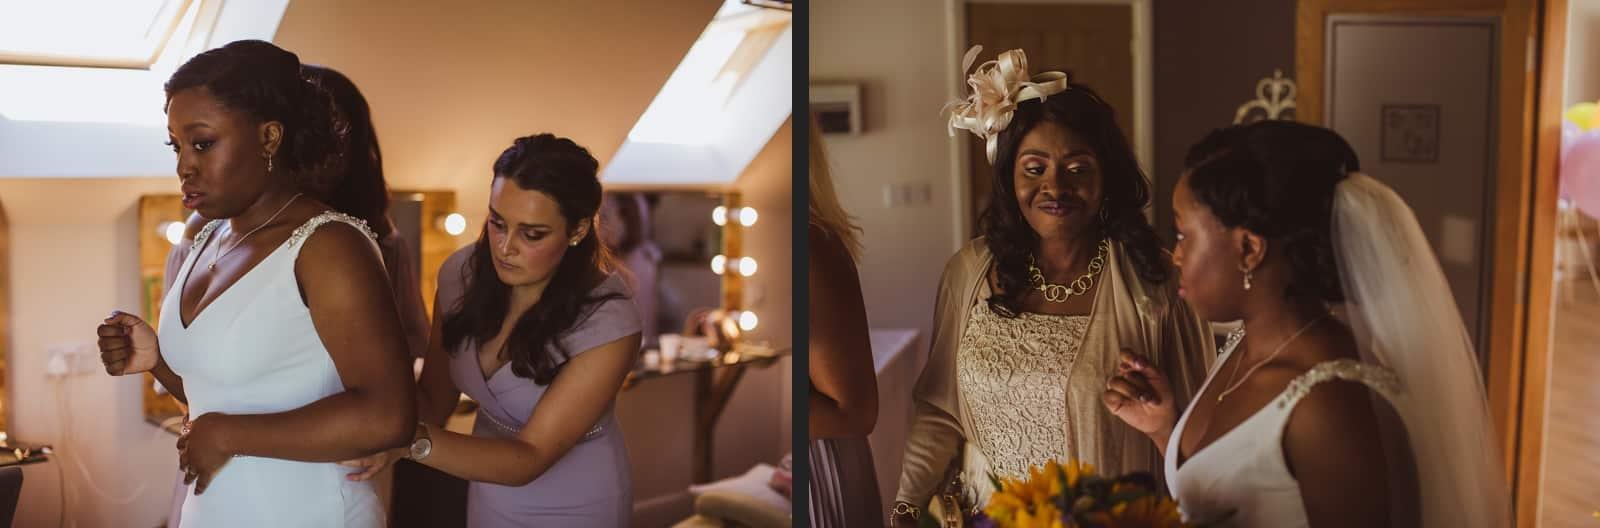 Cotswolds Wedding Photographer 0058